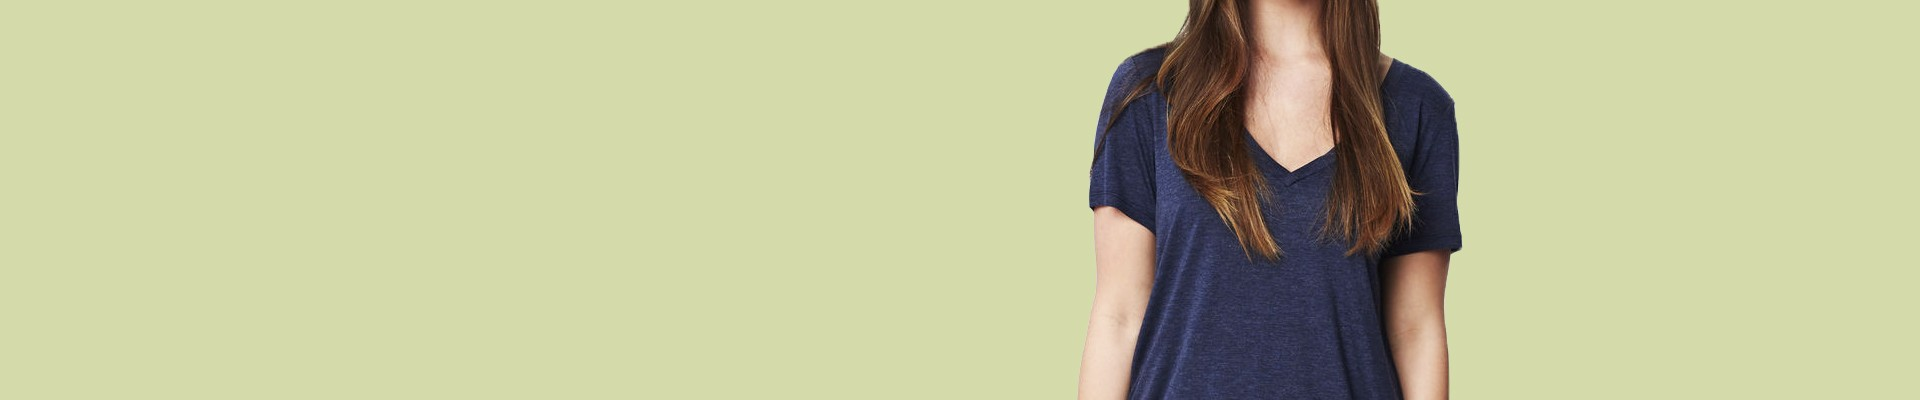 Jual Kaos Wanita - T Shirt Wanita Harga Terbaik